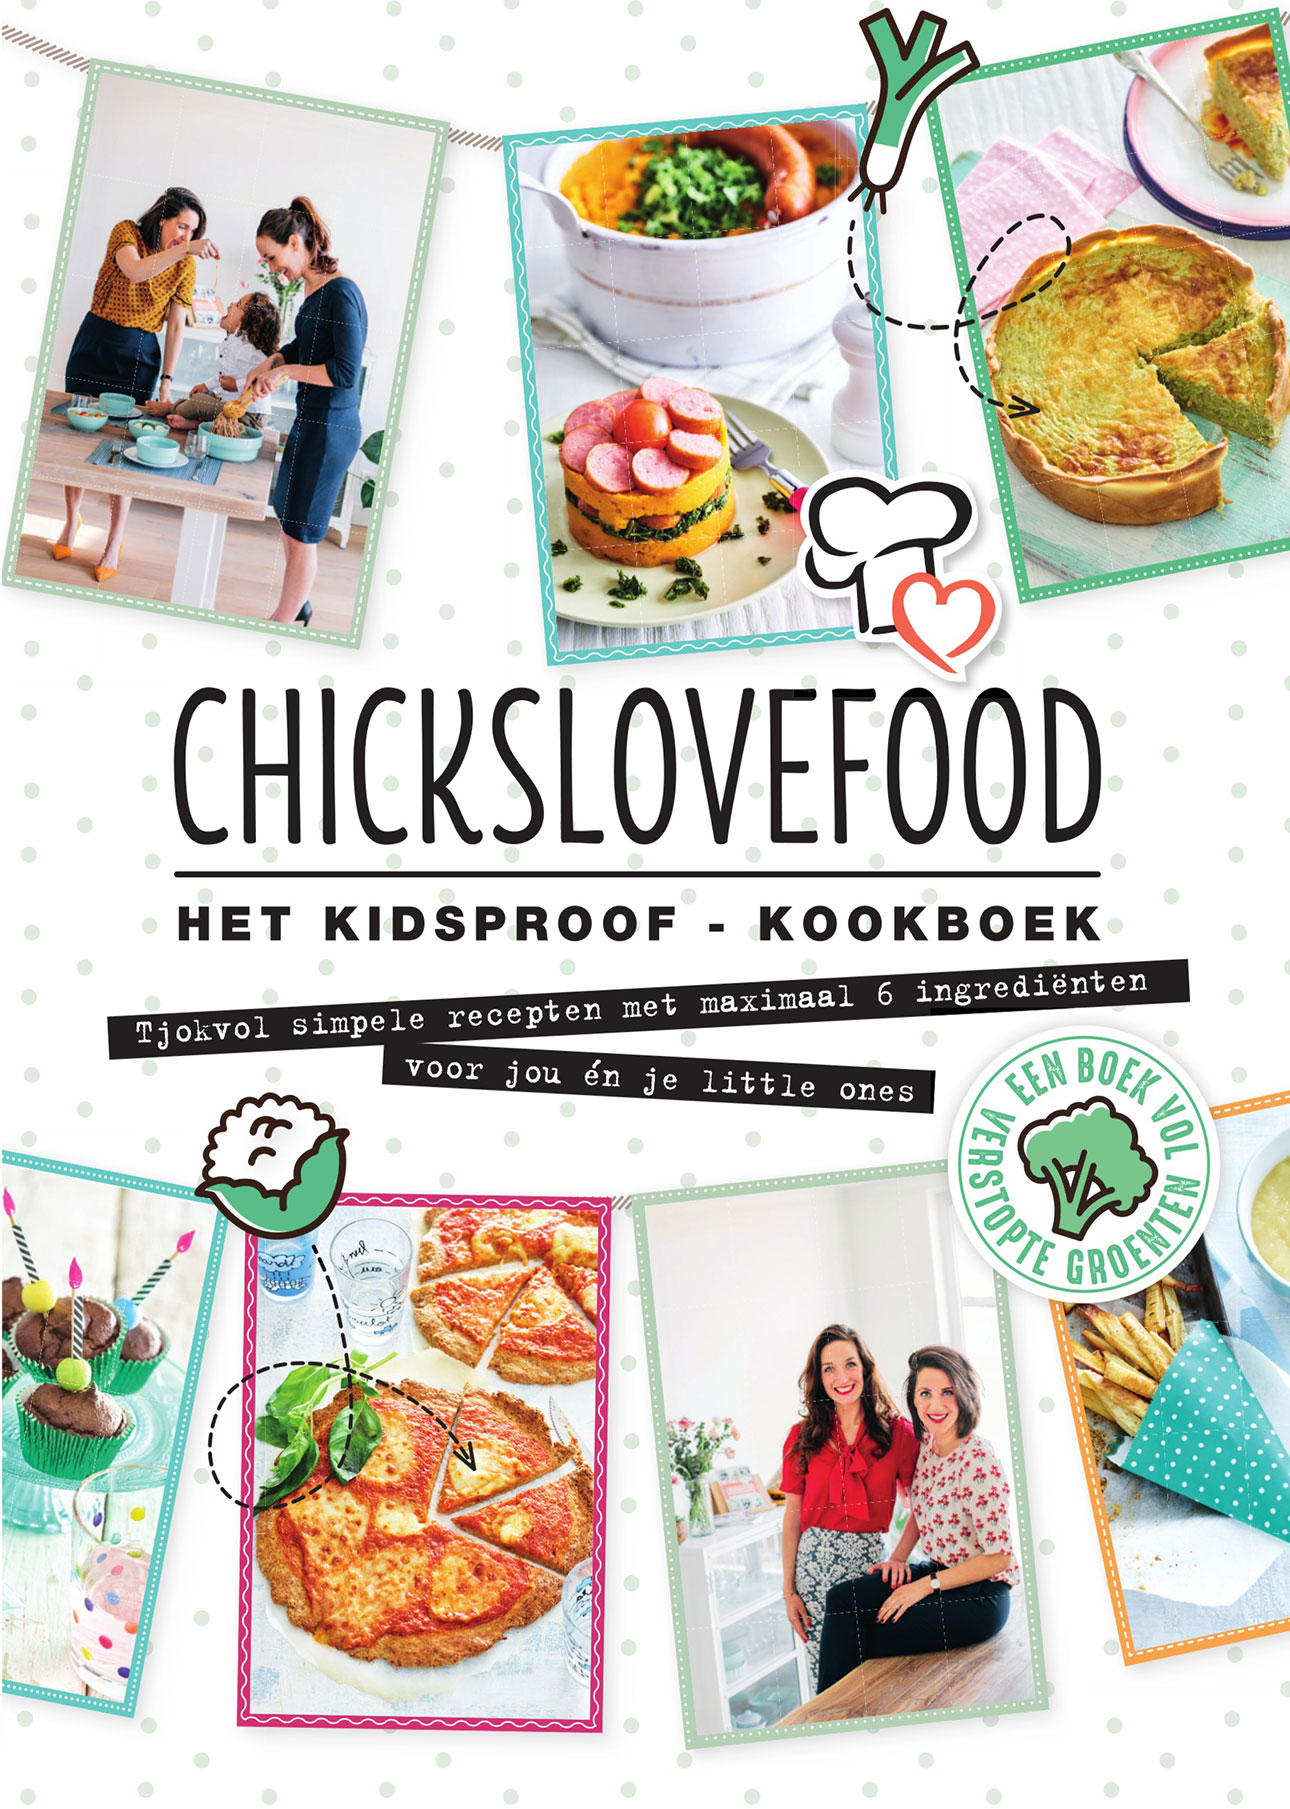 chickslovefood het kidsproof kookboek